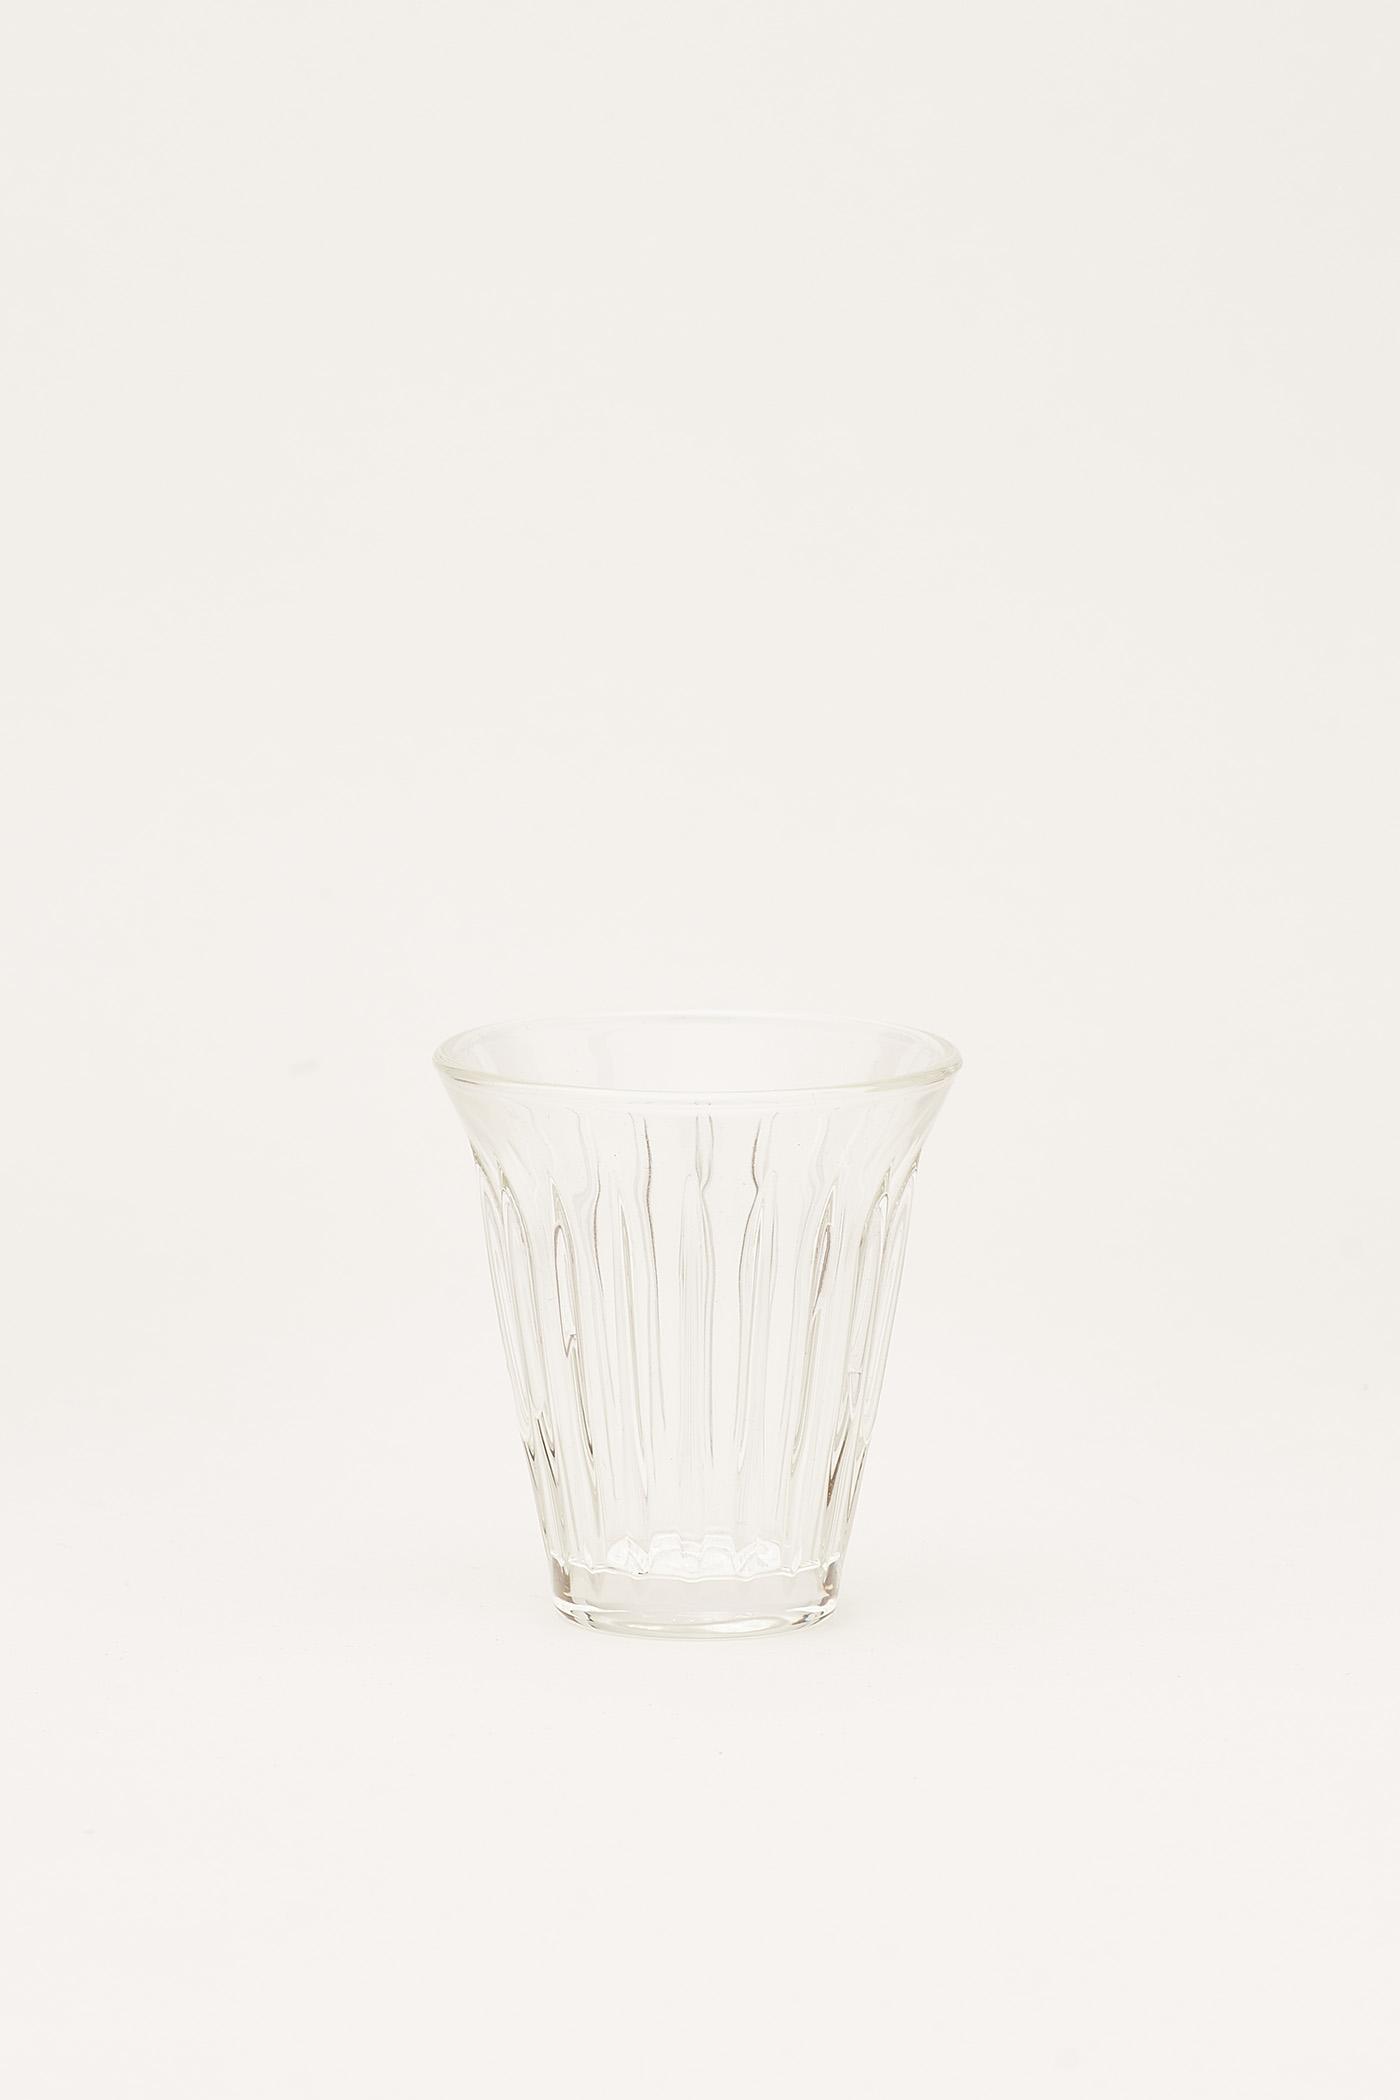 La Rochere Glass Tumbler